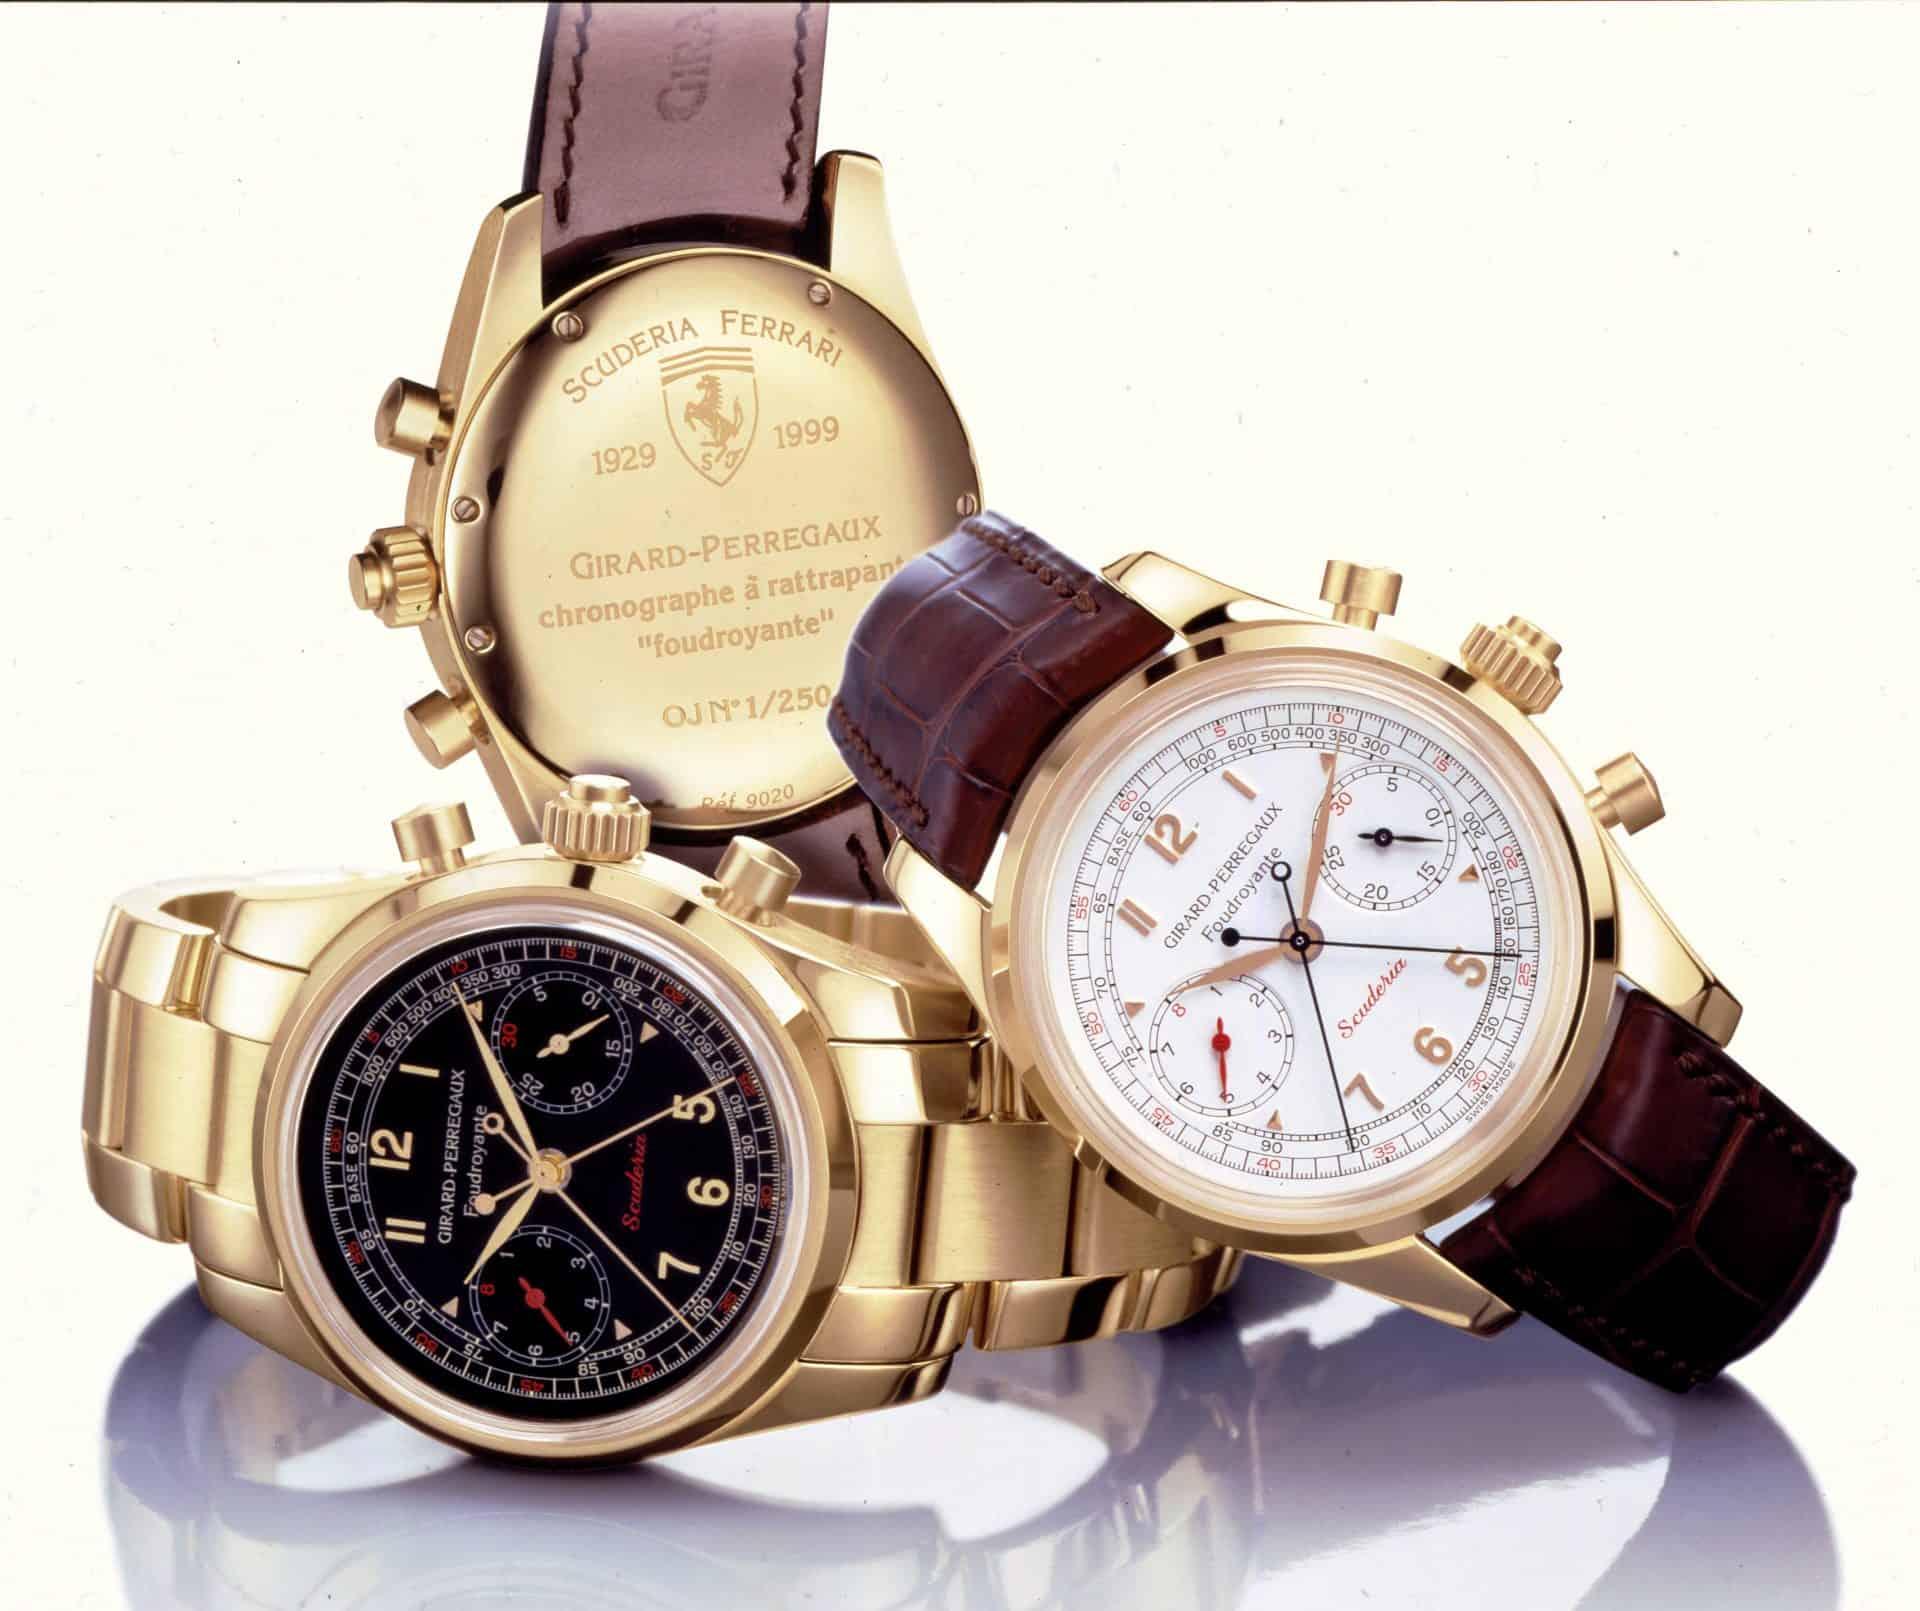 Girard-Perregaux Scuderia Ferrari Chronograph Rattrapante Foudroyante 1999 - Ensemble